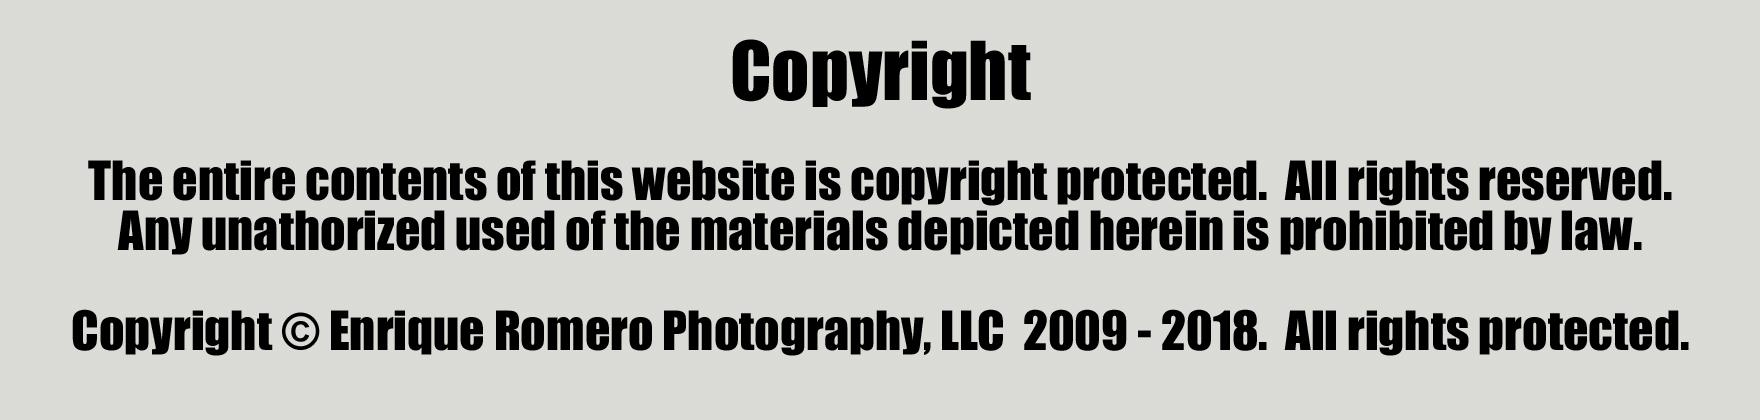 Copyright Notice4.jpg